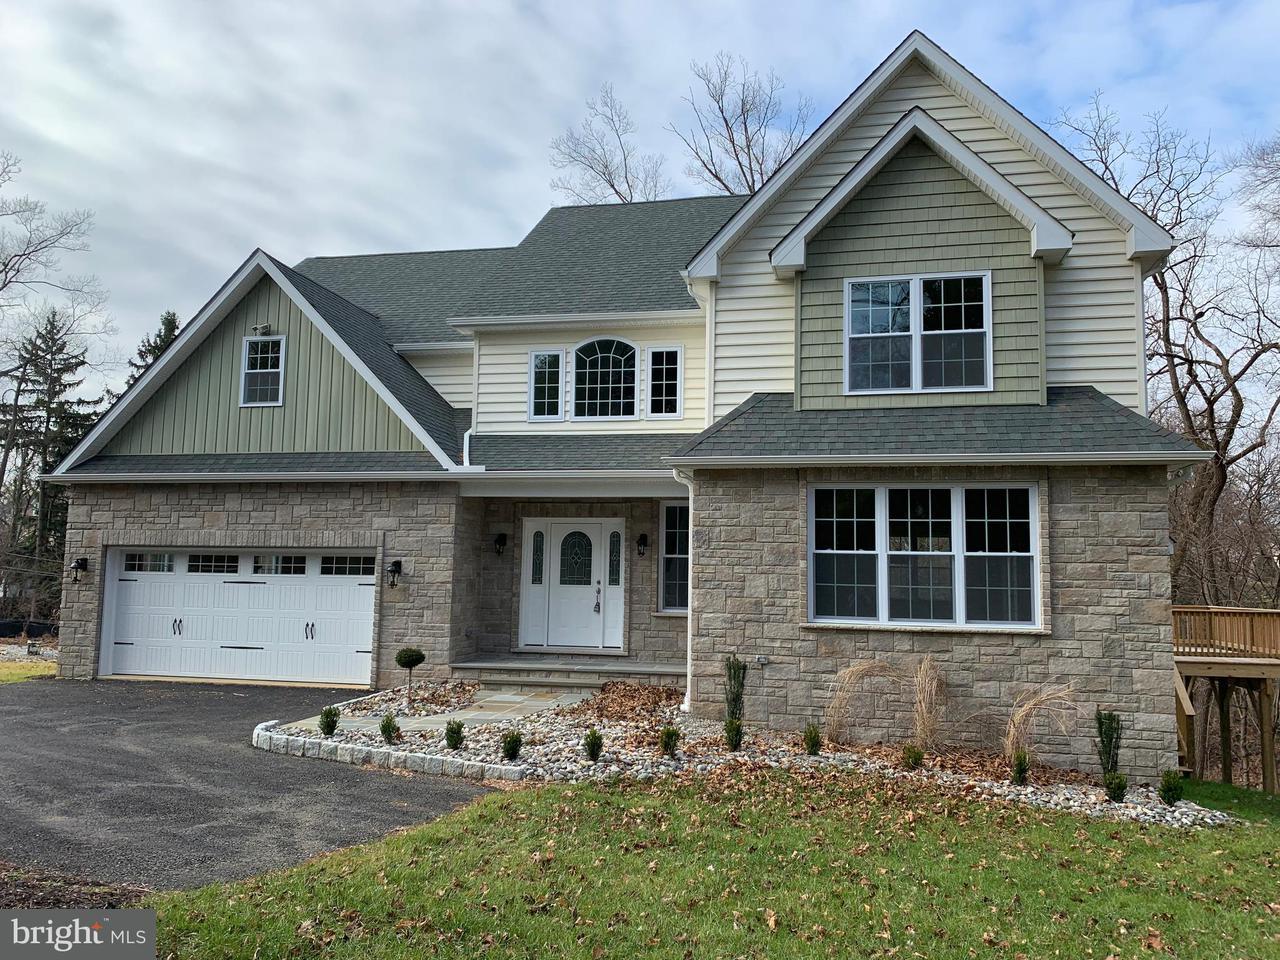 Single Family Home for Sale at 10 E CENTRAL Avenue Paoli, Pennsylvania 19301 United States